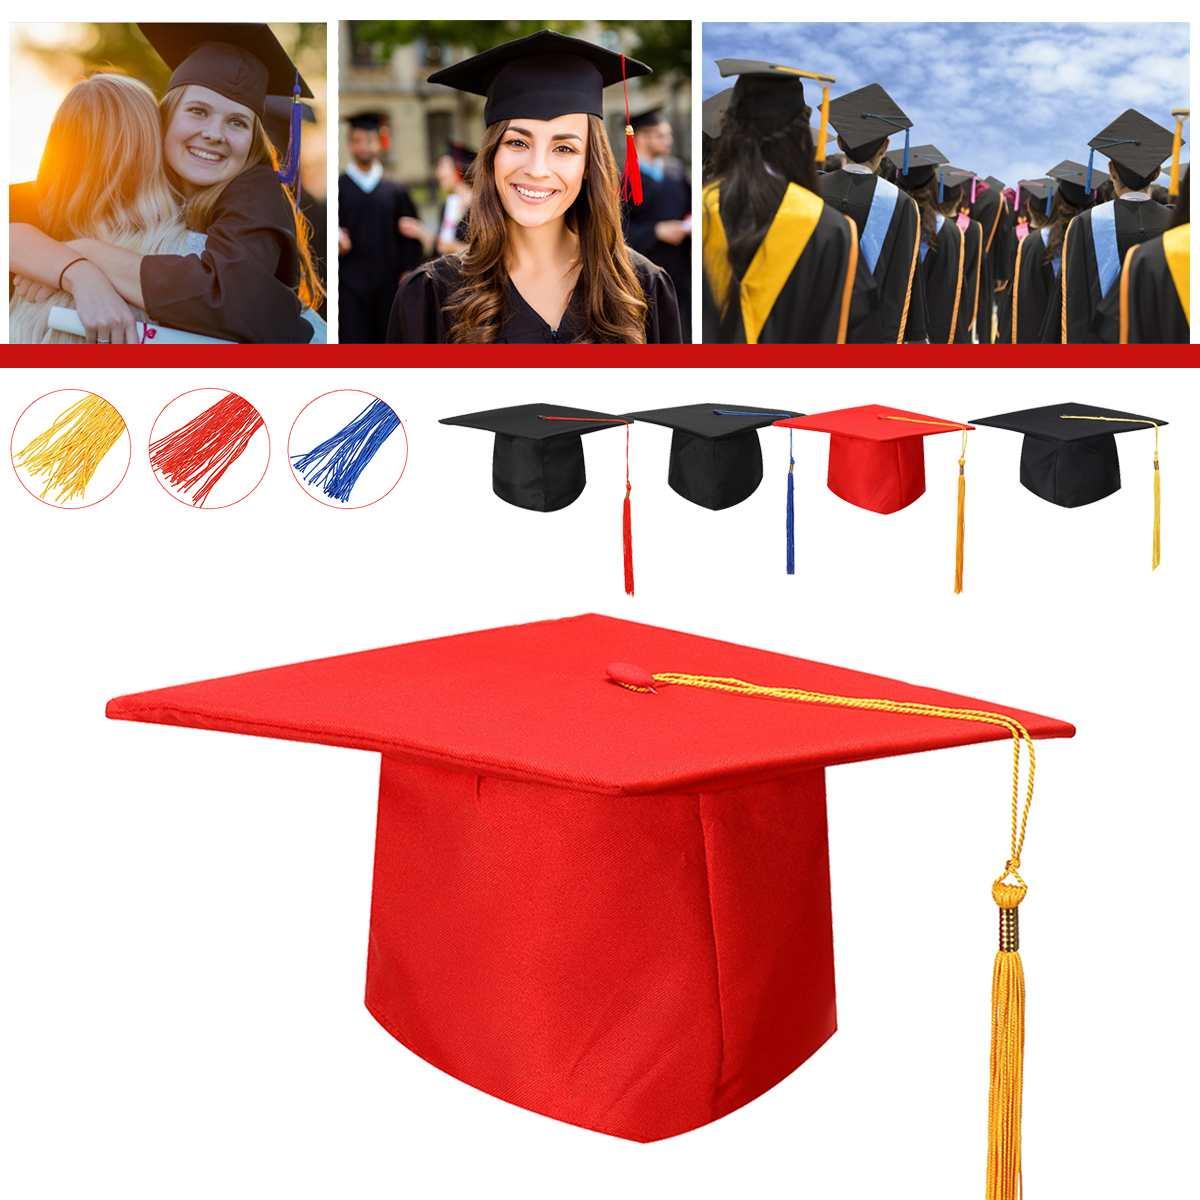 Hat College Bachelor Doctor Chancellor Graduation Board Cap Tassel Costume Party